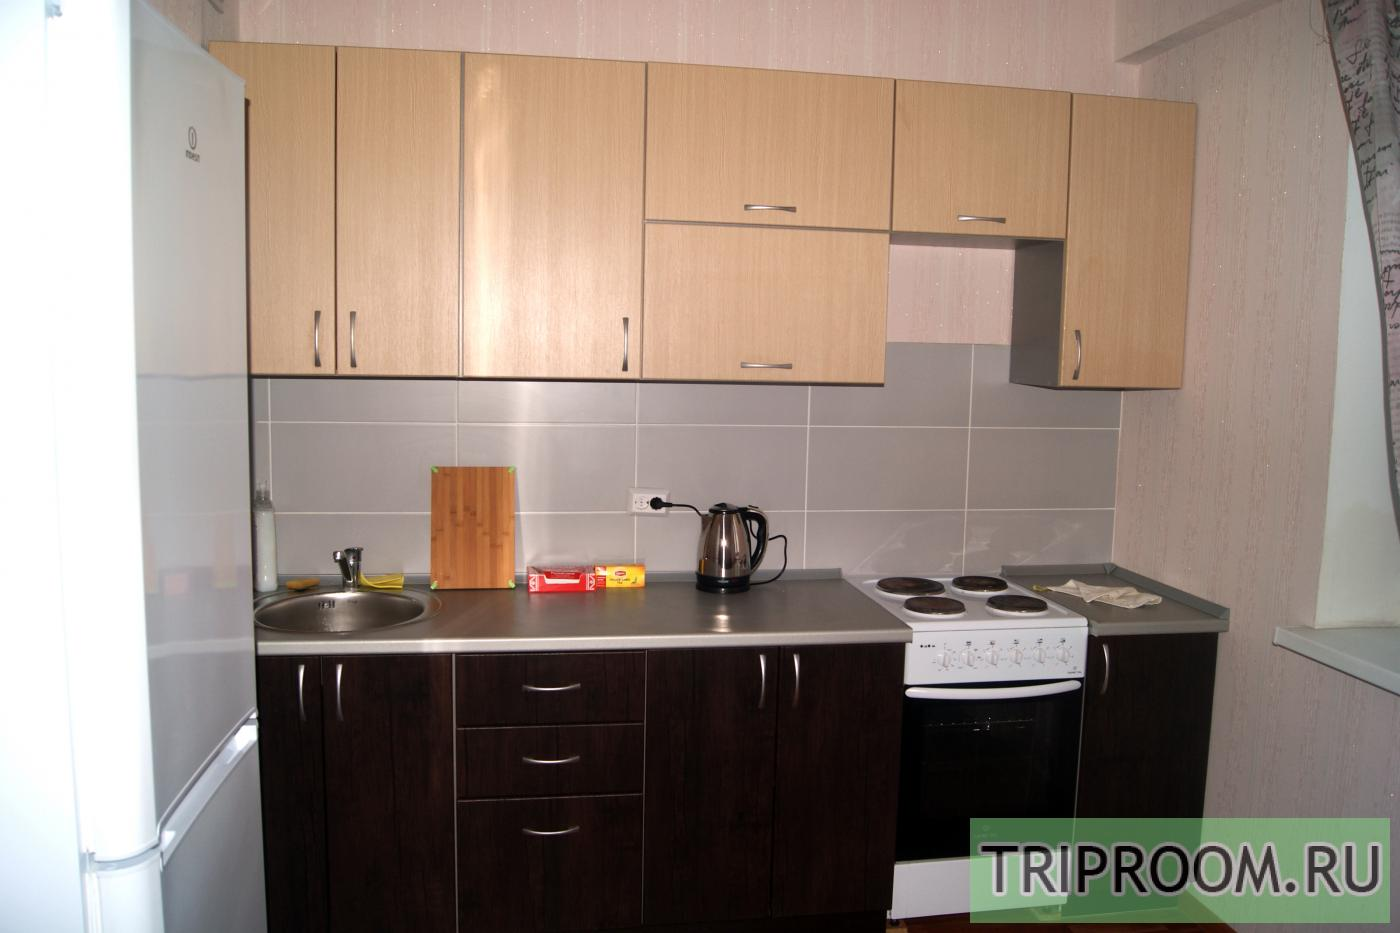 1-комнатная квартира посуточно (вариант № 16809), ул. п.смородина, фото № 3